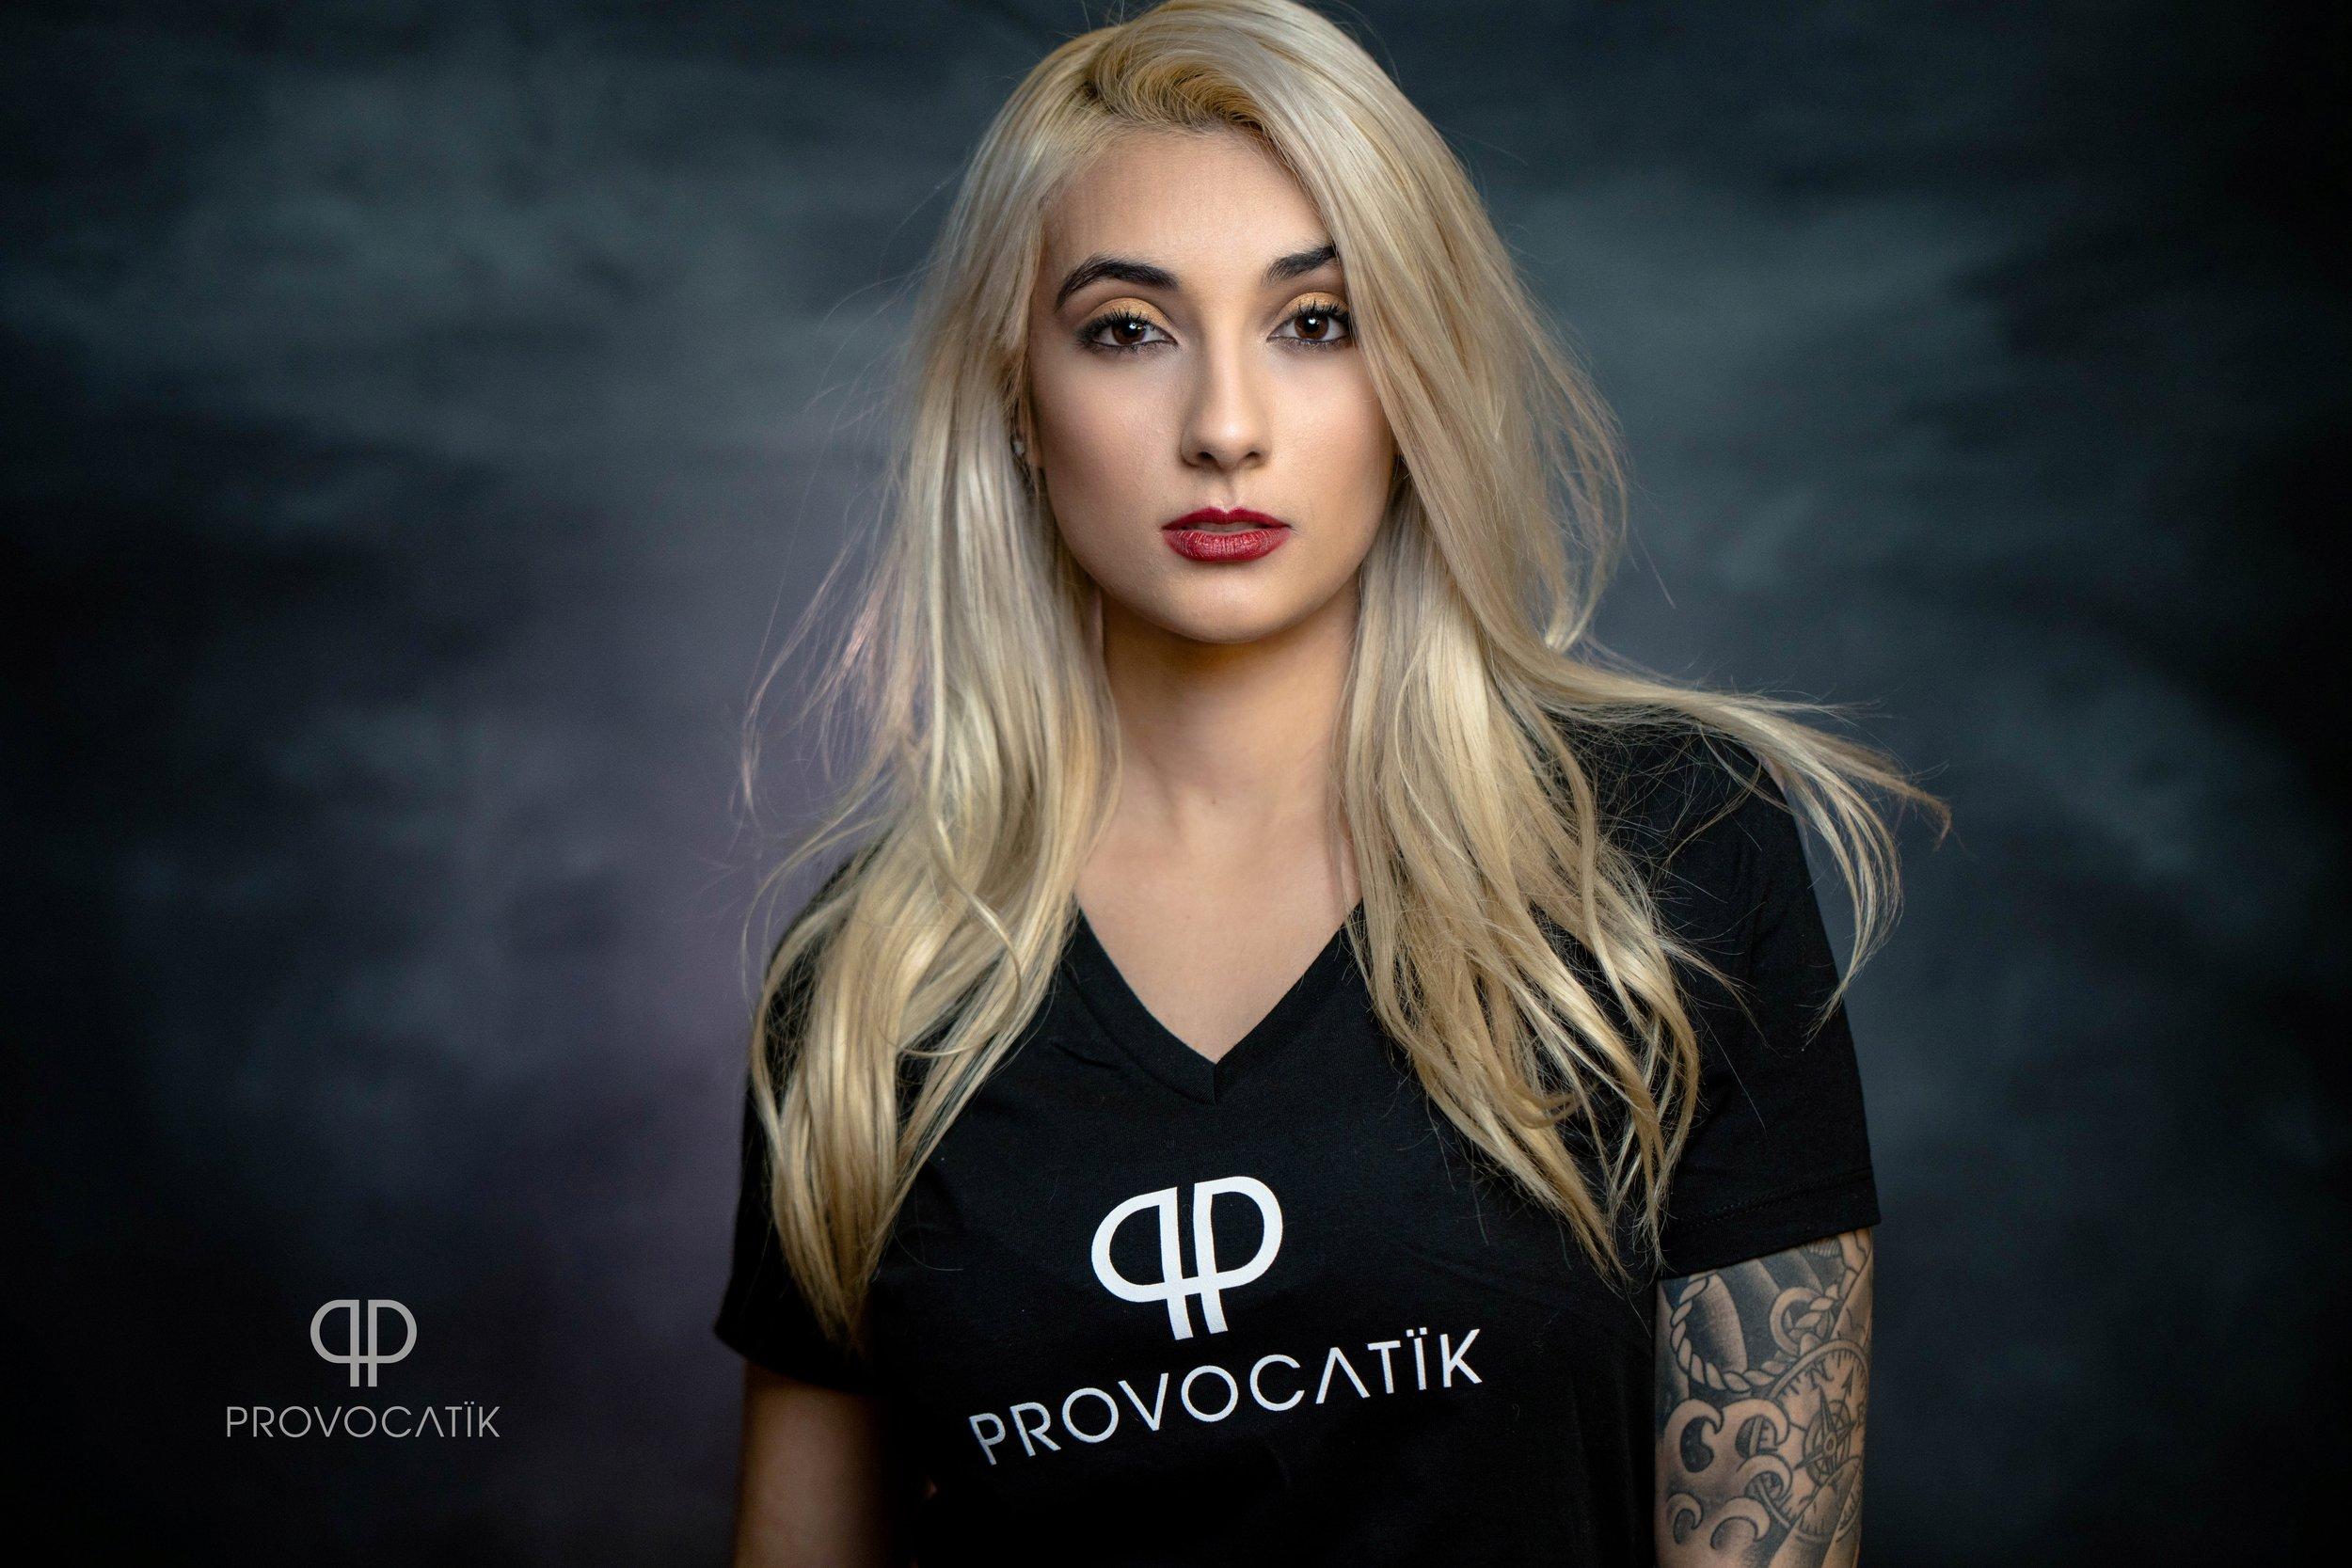 studio delensmode fashion portrait photographer